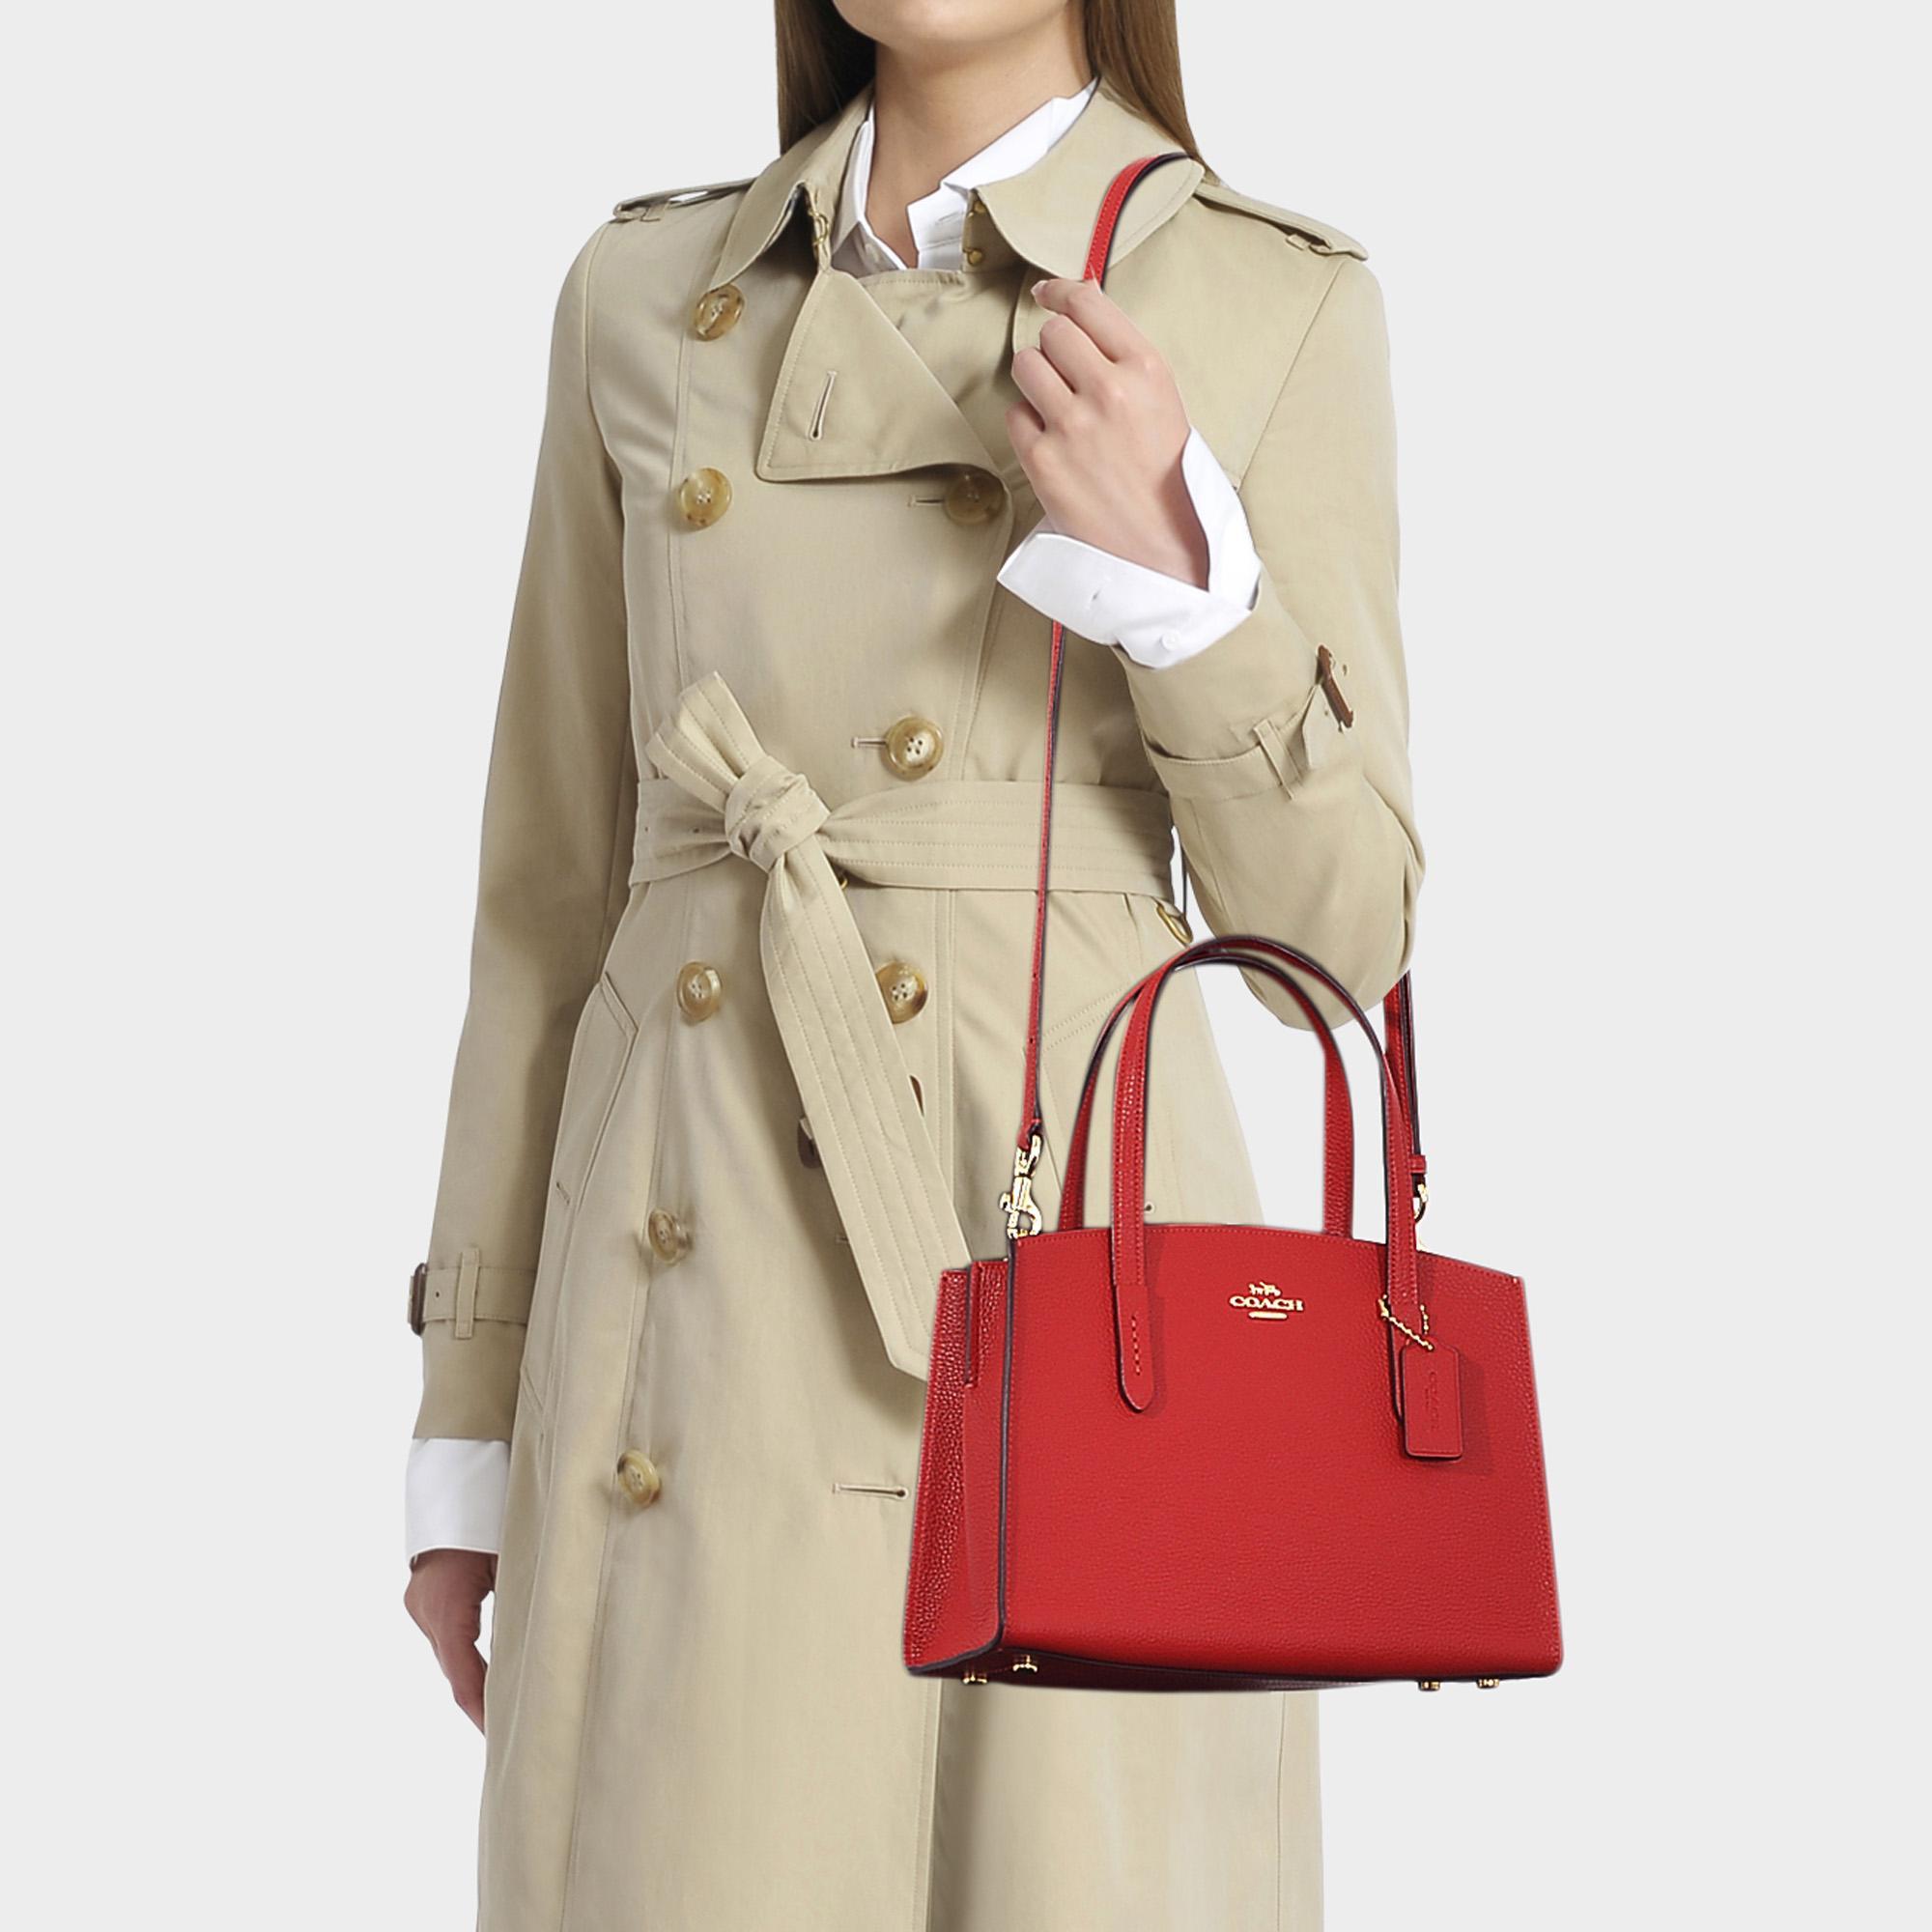 Charlie 28 Carryall Bag In Red Calfskin